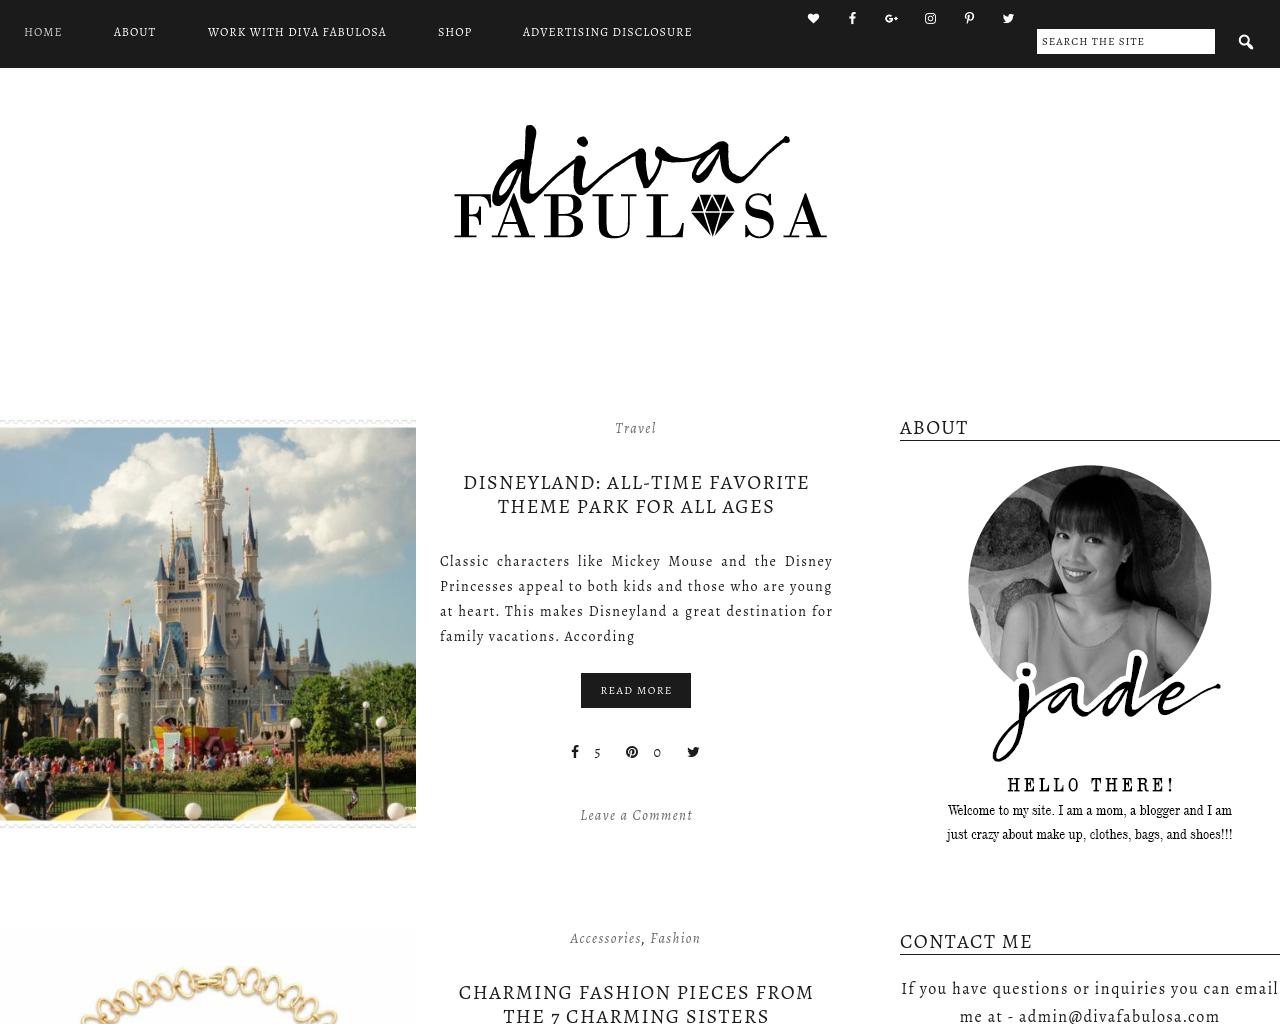 Diva-Fabulosa-Advertising-Reviews-Pricing